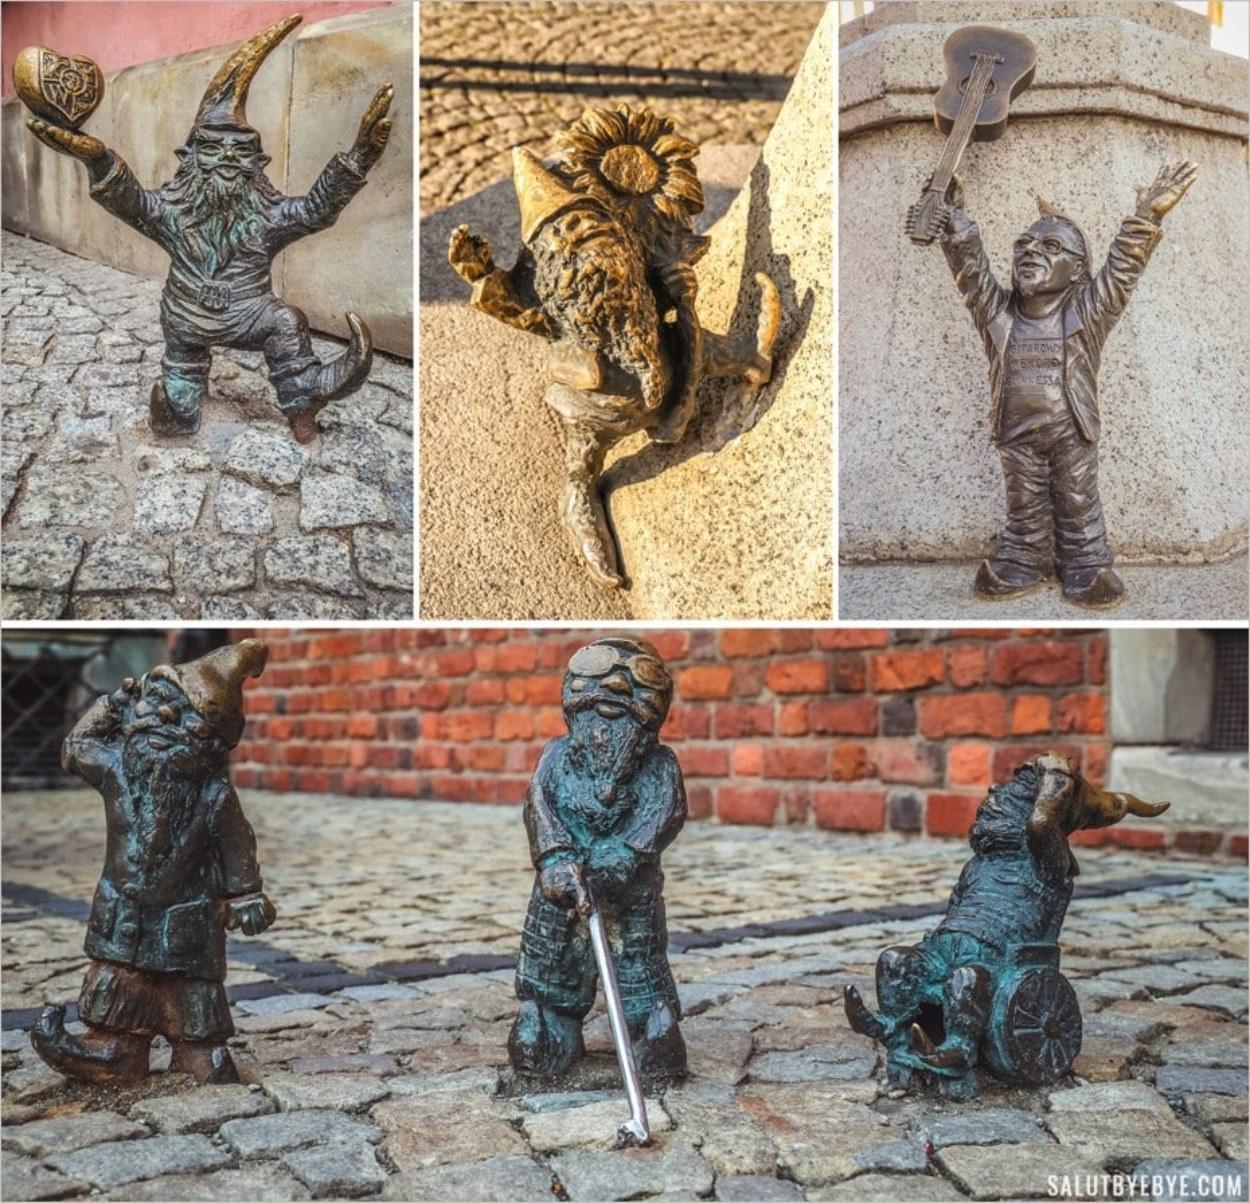 Les lutins de Wroclaw en Pologne